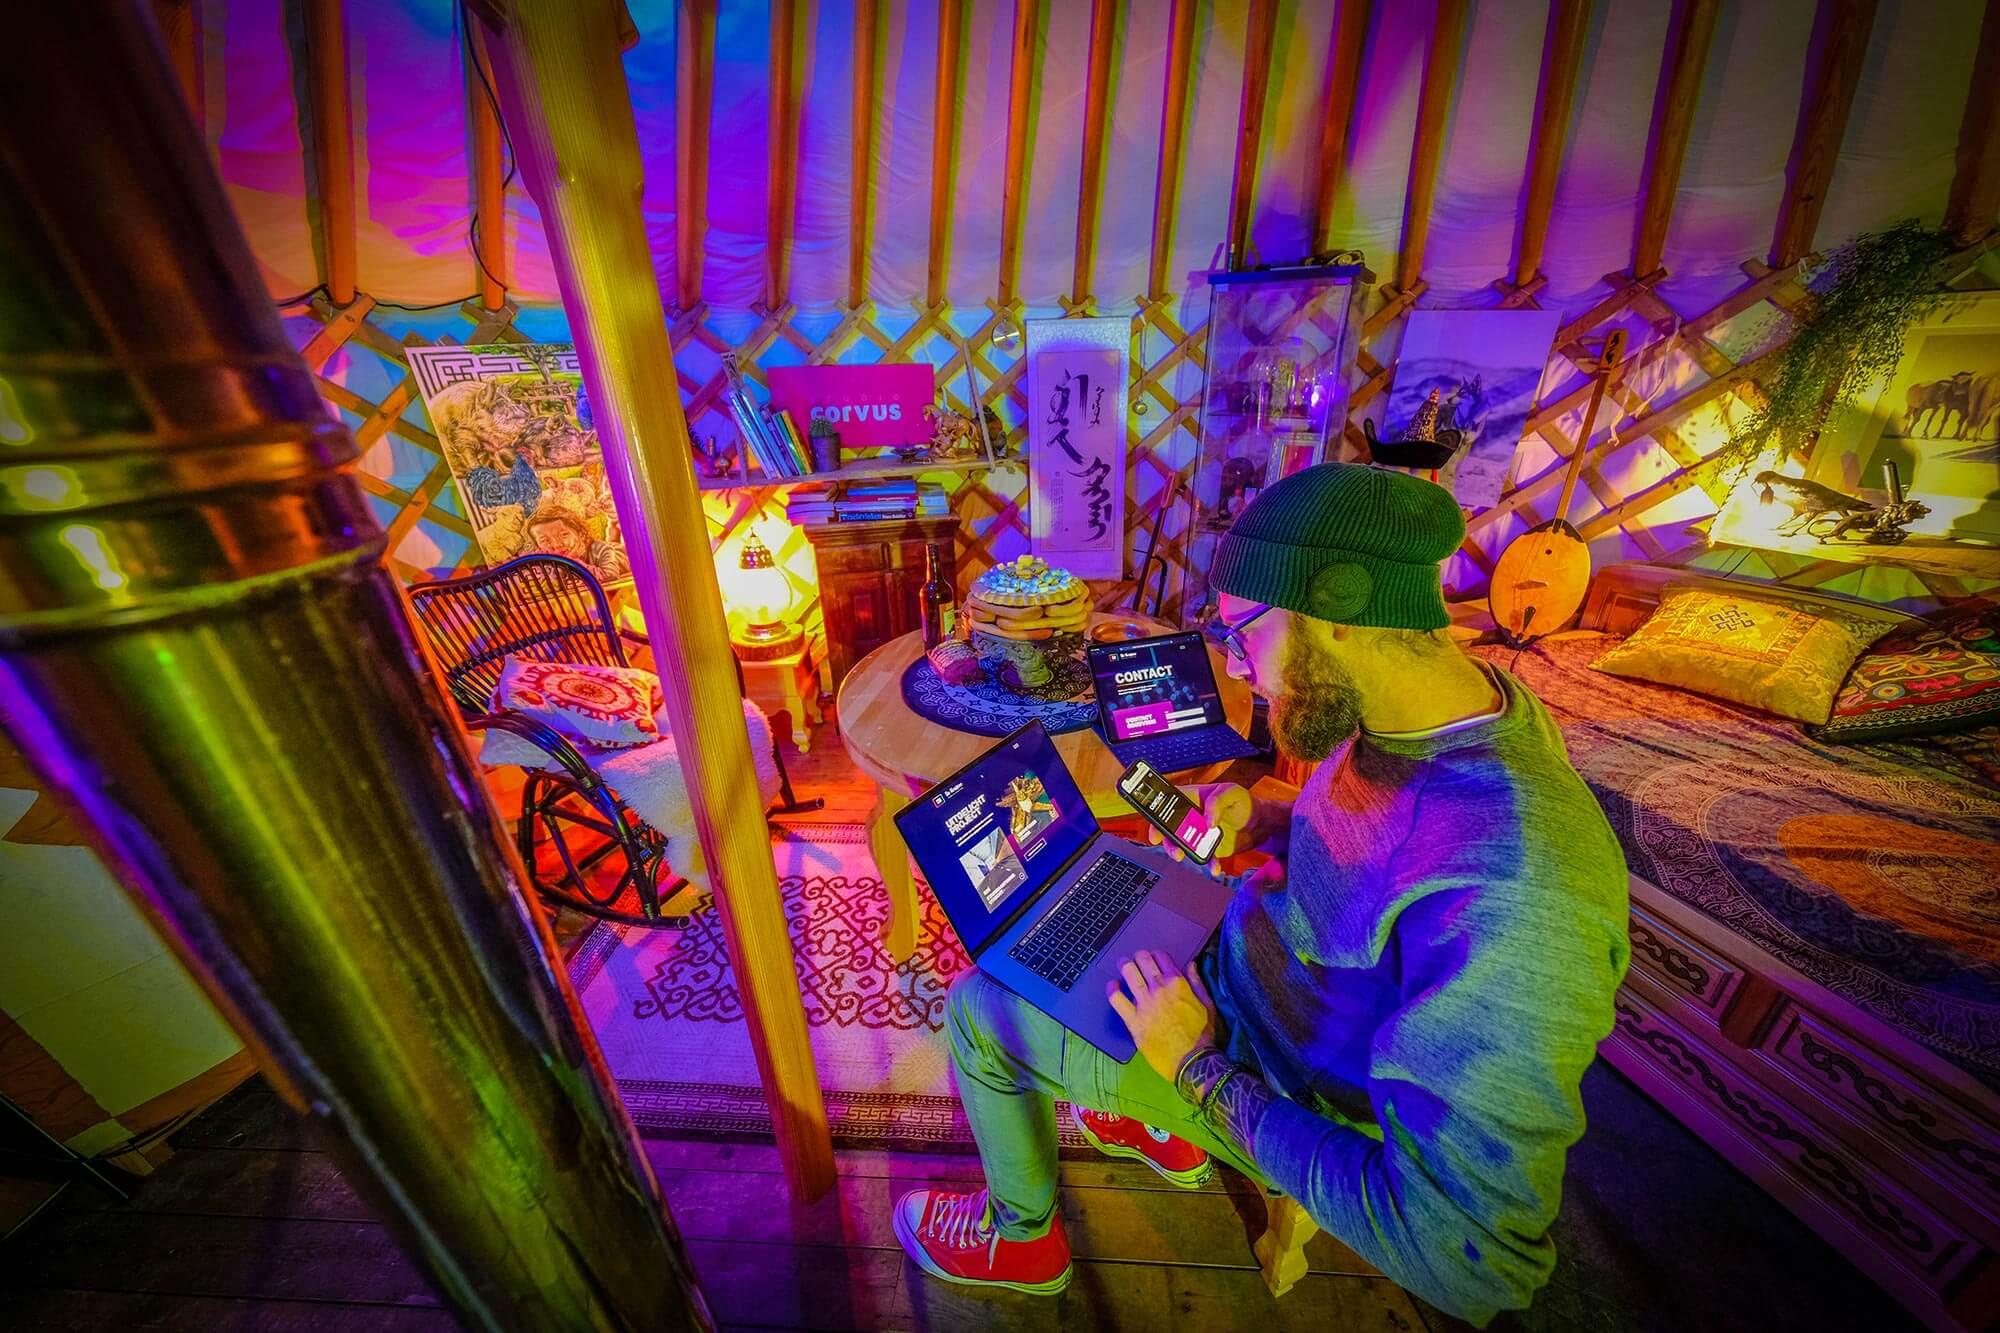 Rowan Hartsuiker working on a laptop inside his yurt studio